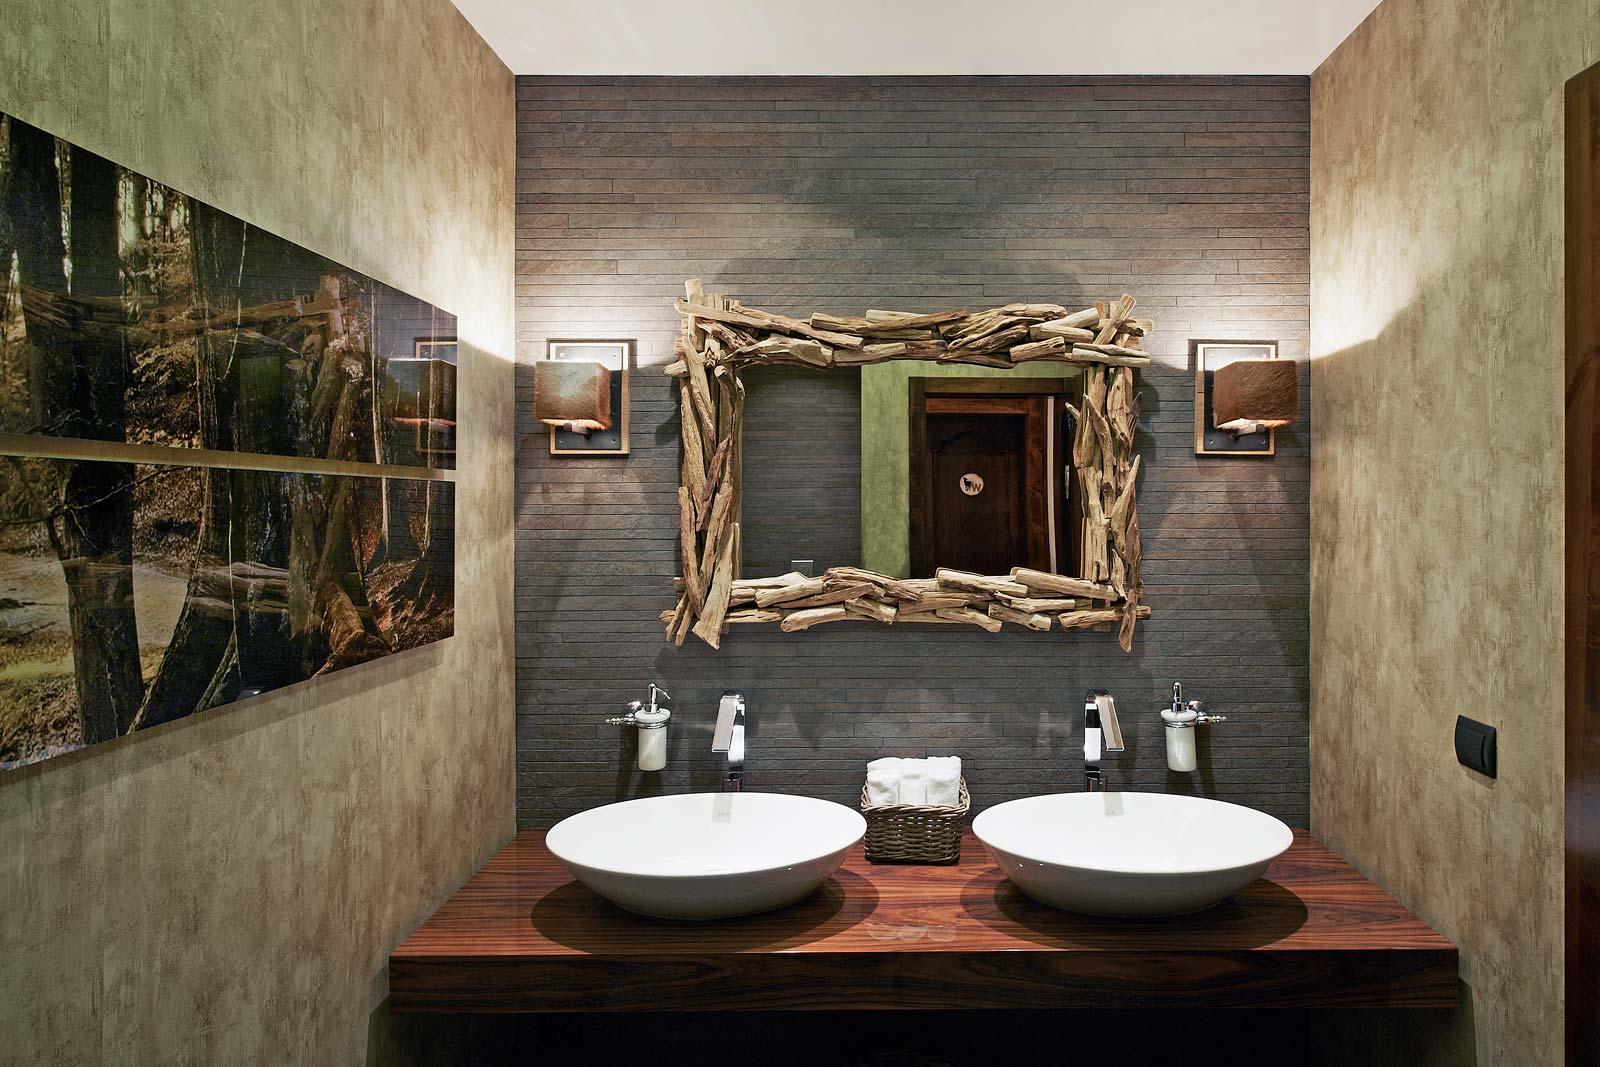 erik_bernard_interior_design_restaurant_kiev_10